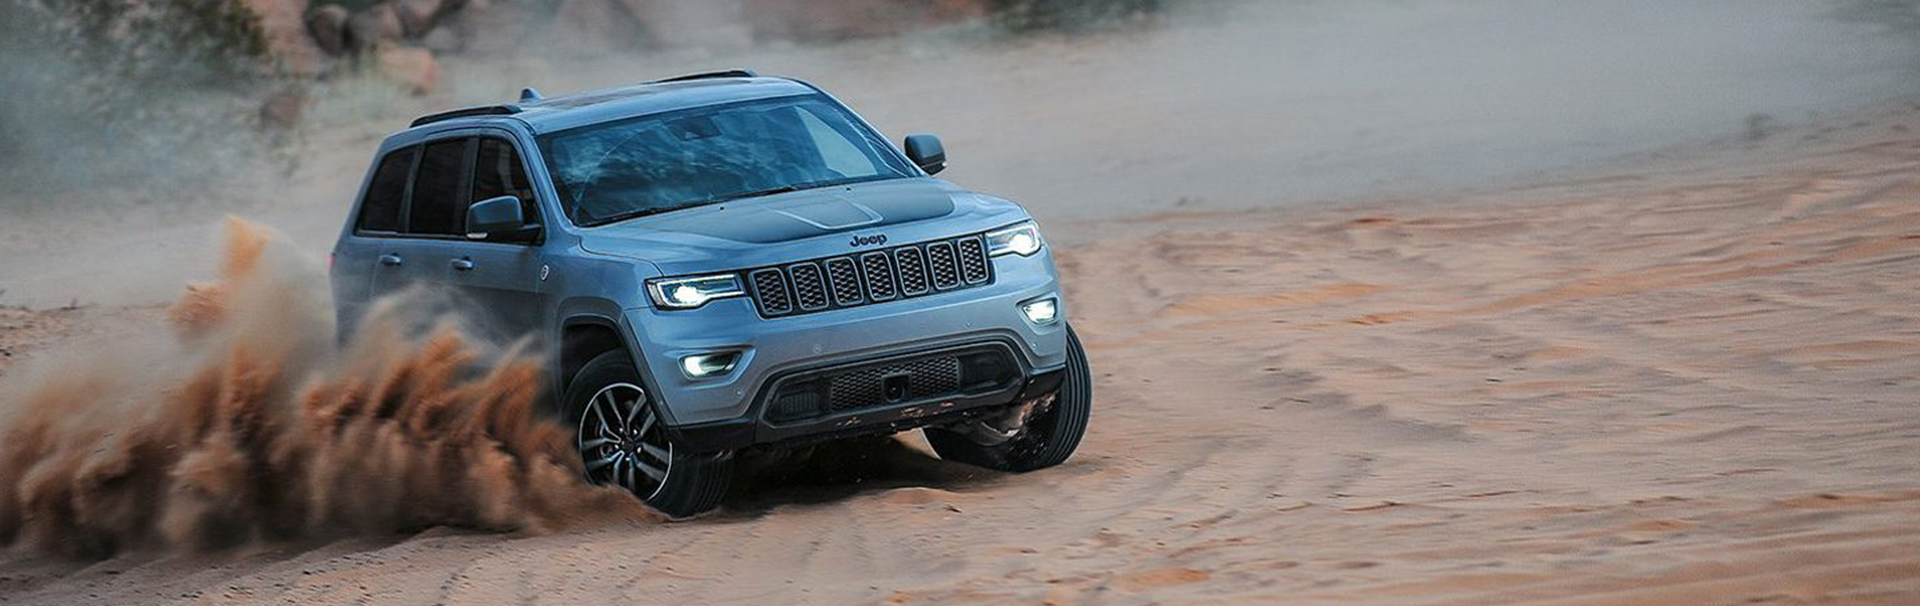 Jeep® Grand Cherokee Trailhawk